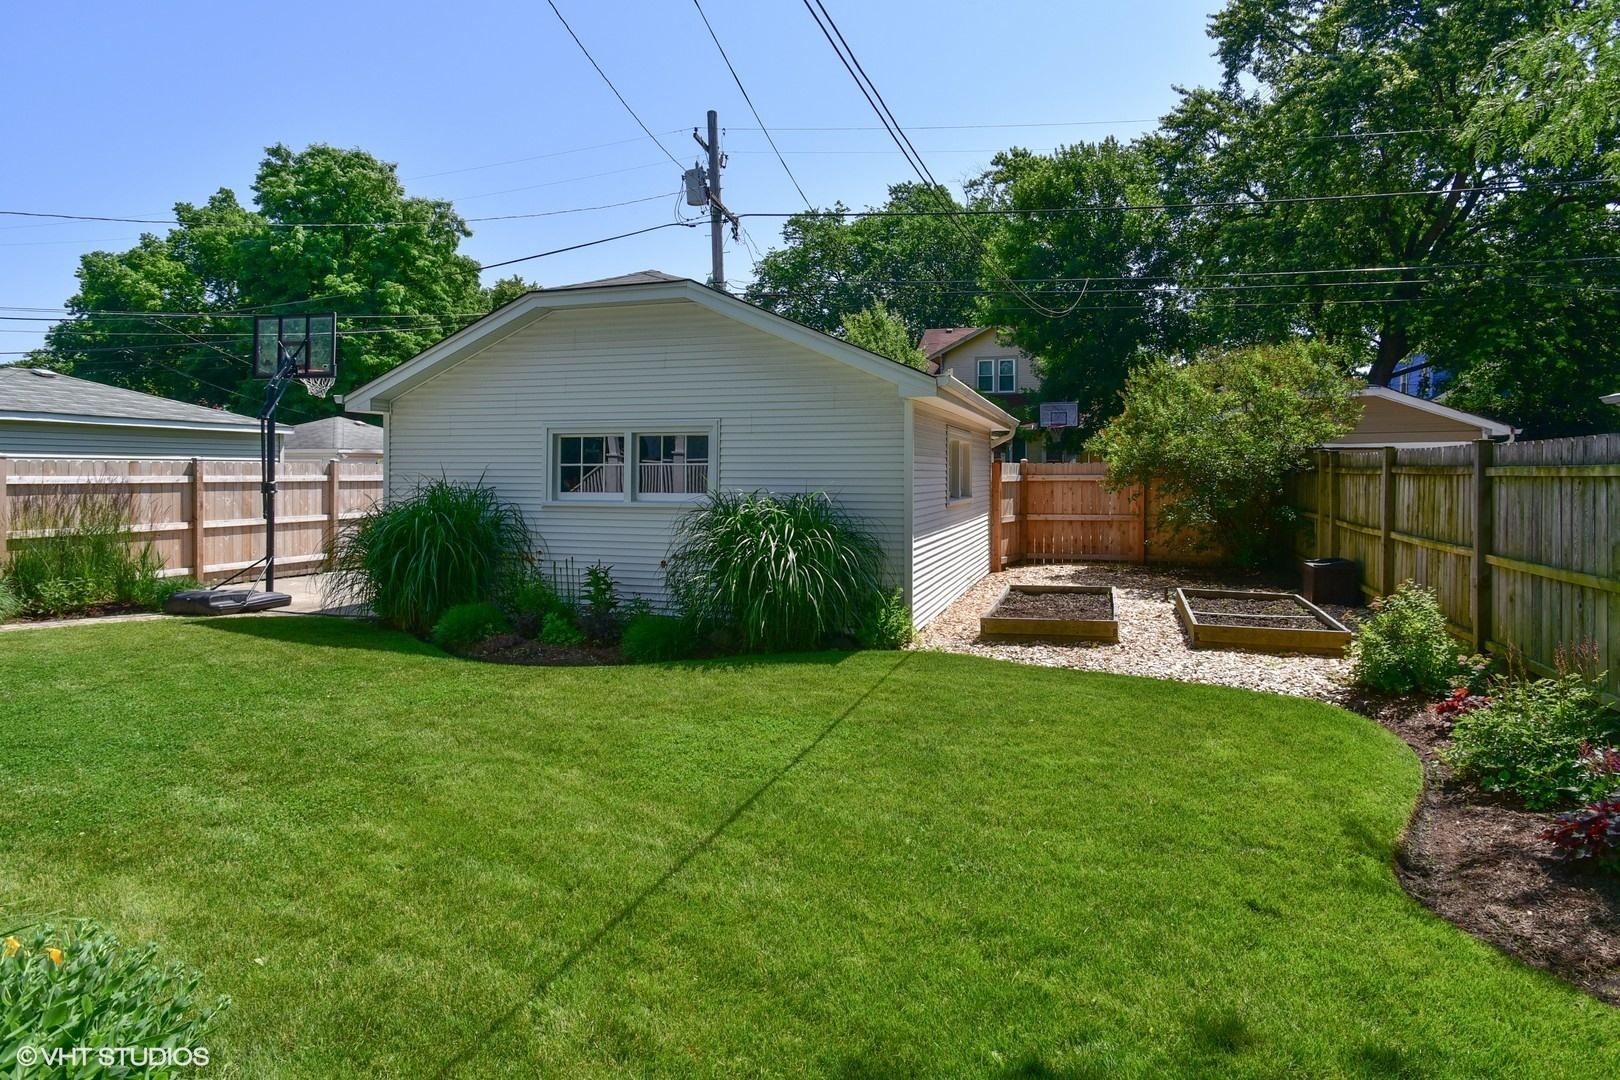 738 north lombard avenue oak park il 60302 john for John paul greene custom homes